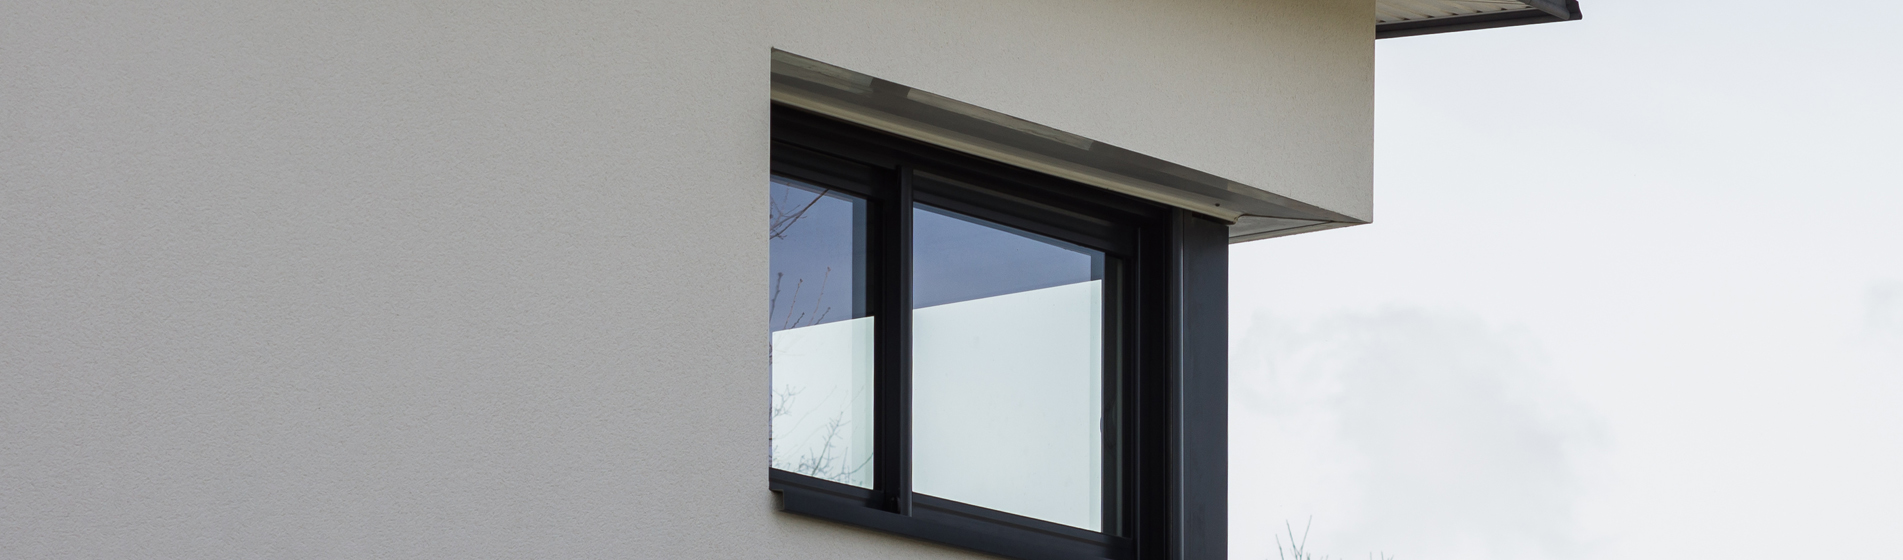 poser fenêtre alu 13 Bouches-du-Rhône